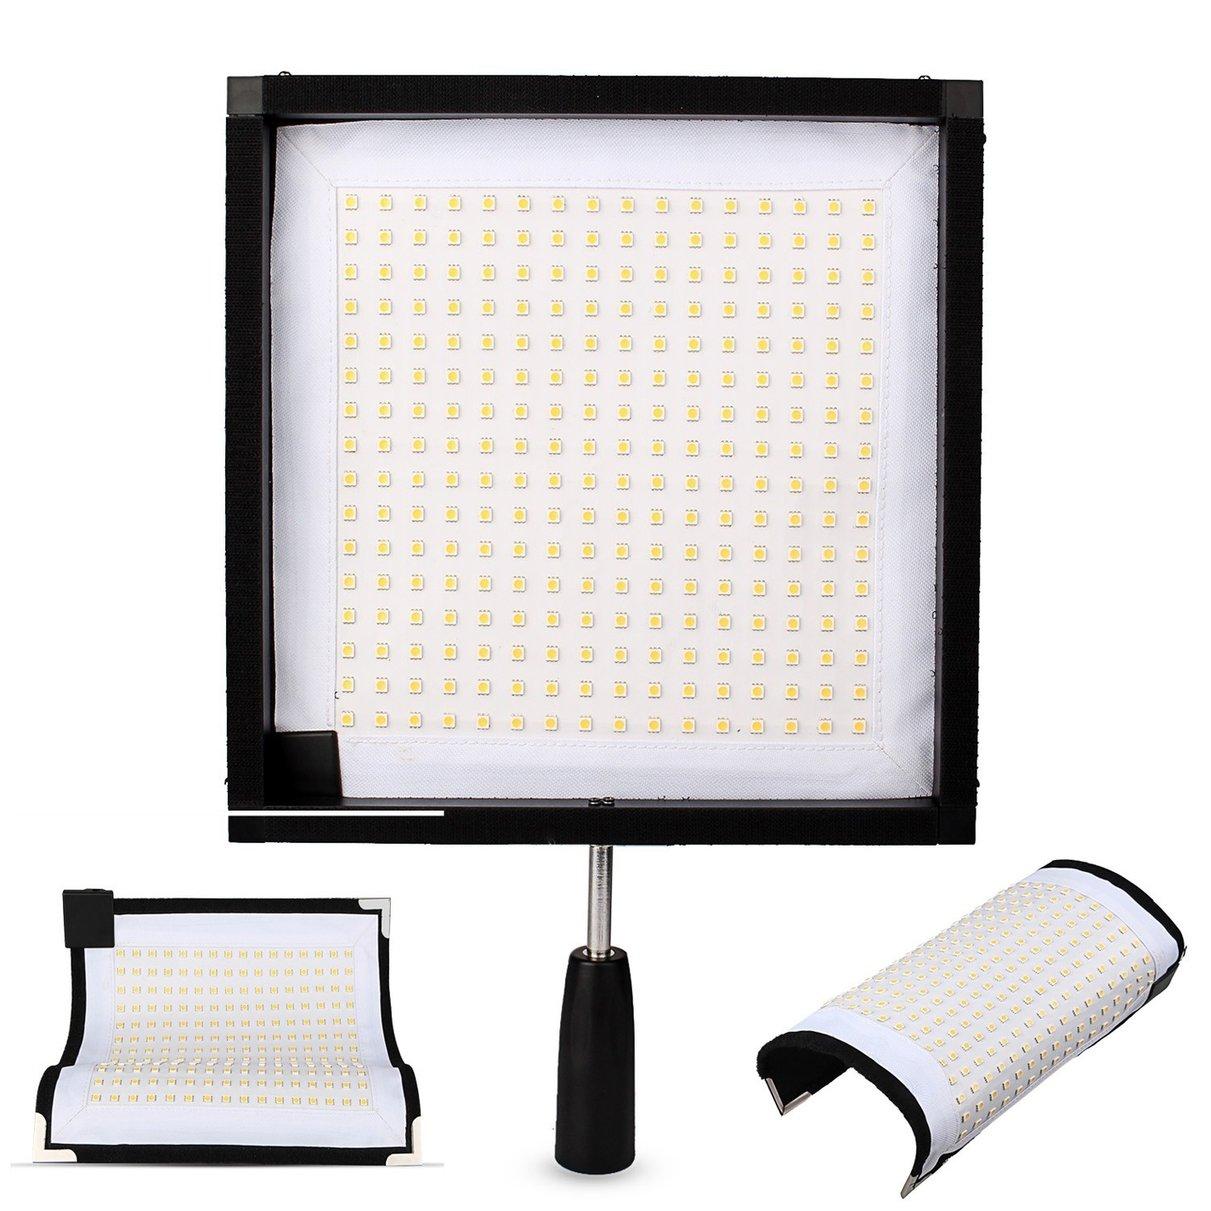 Travor FL-3030 30x30cm Flex Mat 5500K 256 LED Flexible Moldable LED Video Fabric Light Slim Ultralight Panel with 2.4G Remote